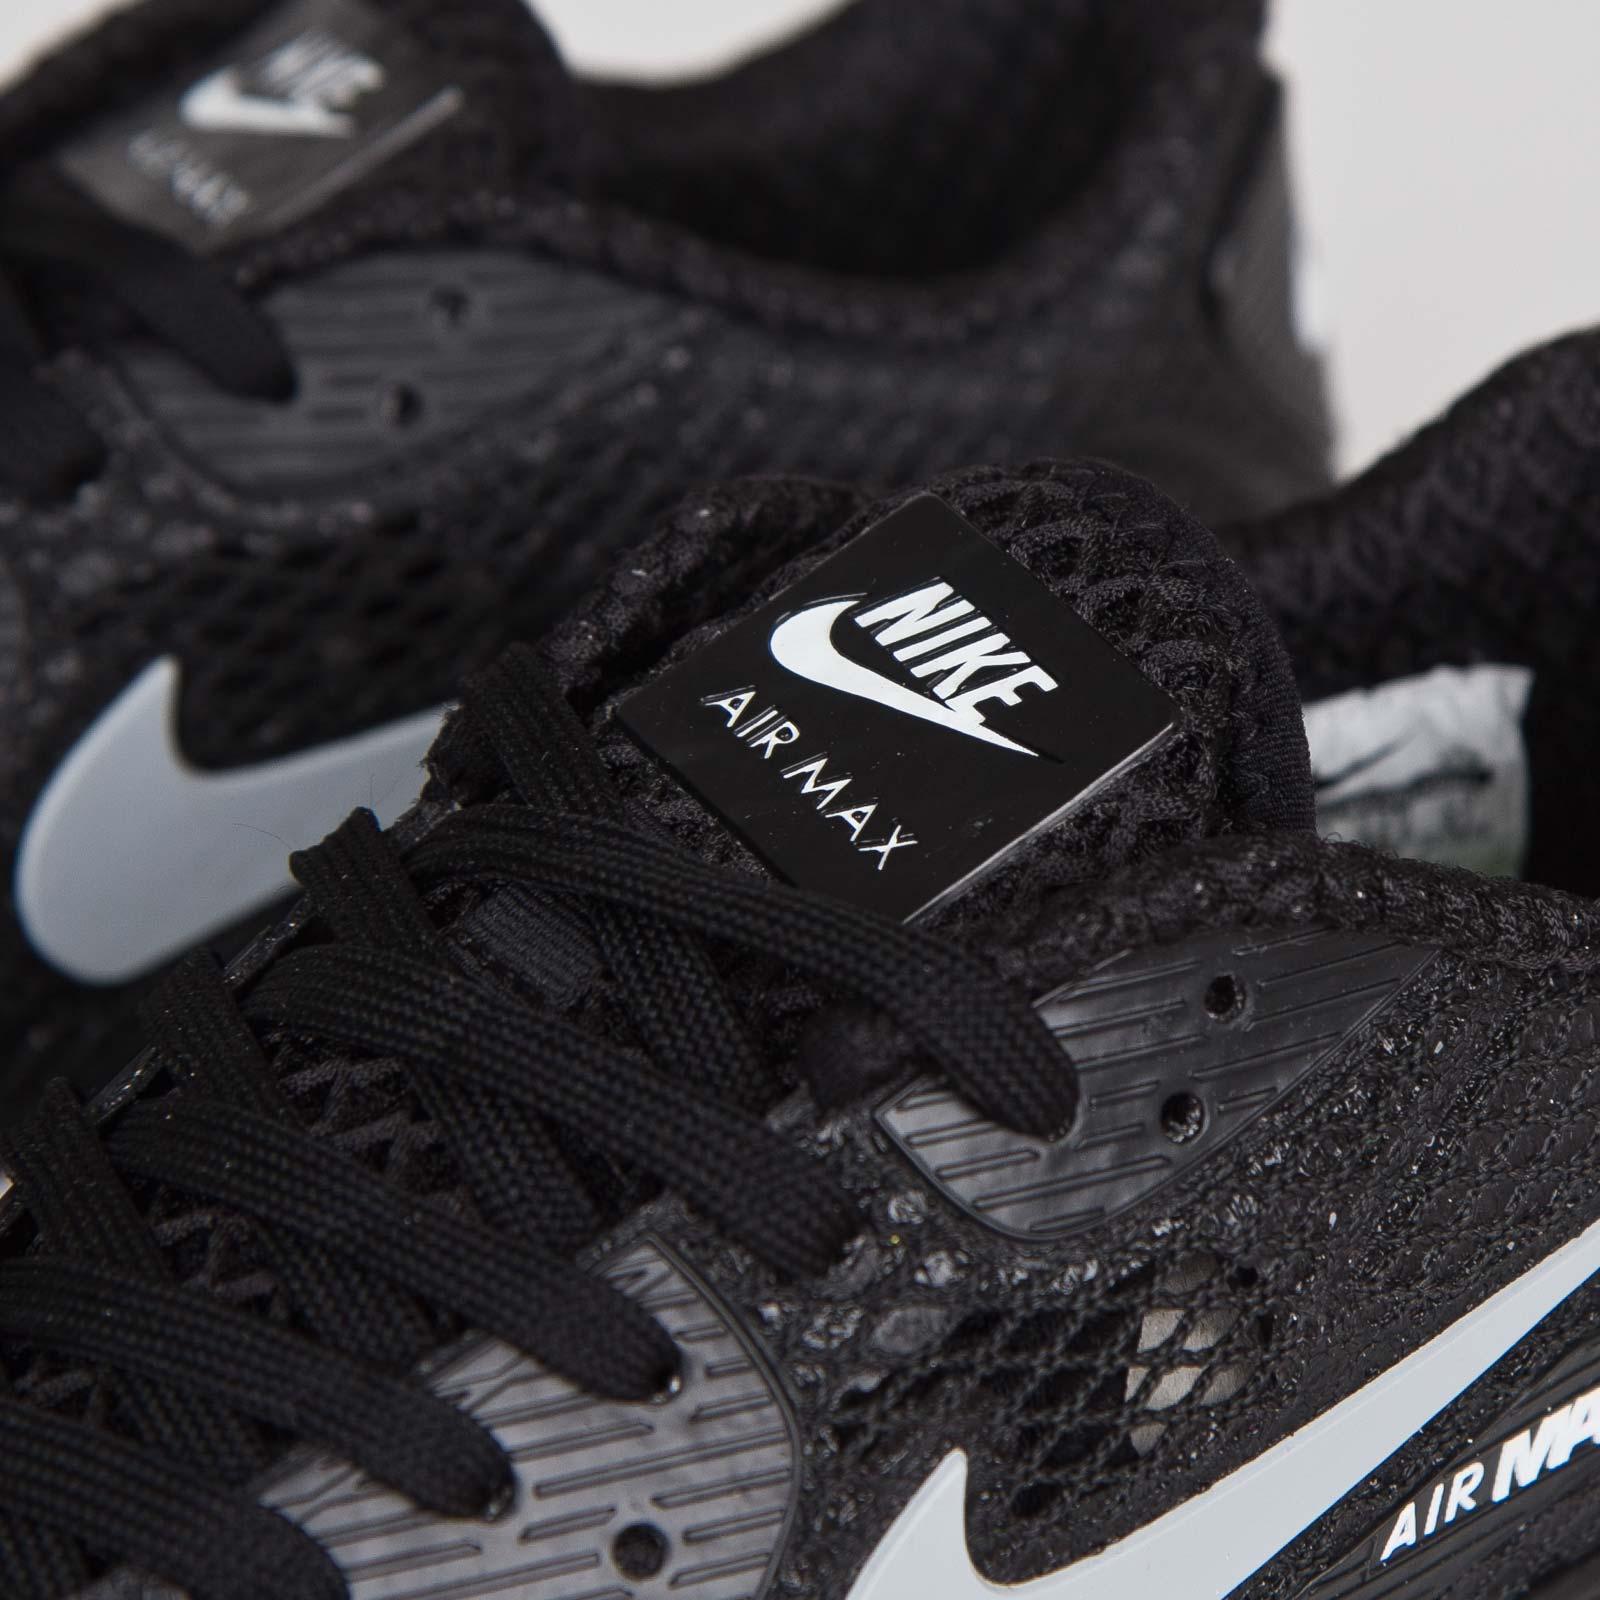 innovative design 6607f 83474 Nike Air Max 90 Ultra Br Plus QS - 810170-002 - Sneakersnstuff   sneakers    streetwear online since 1999